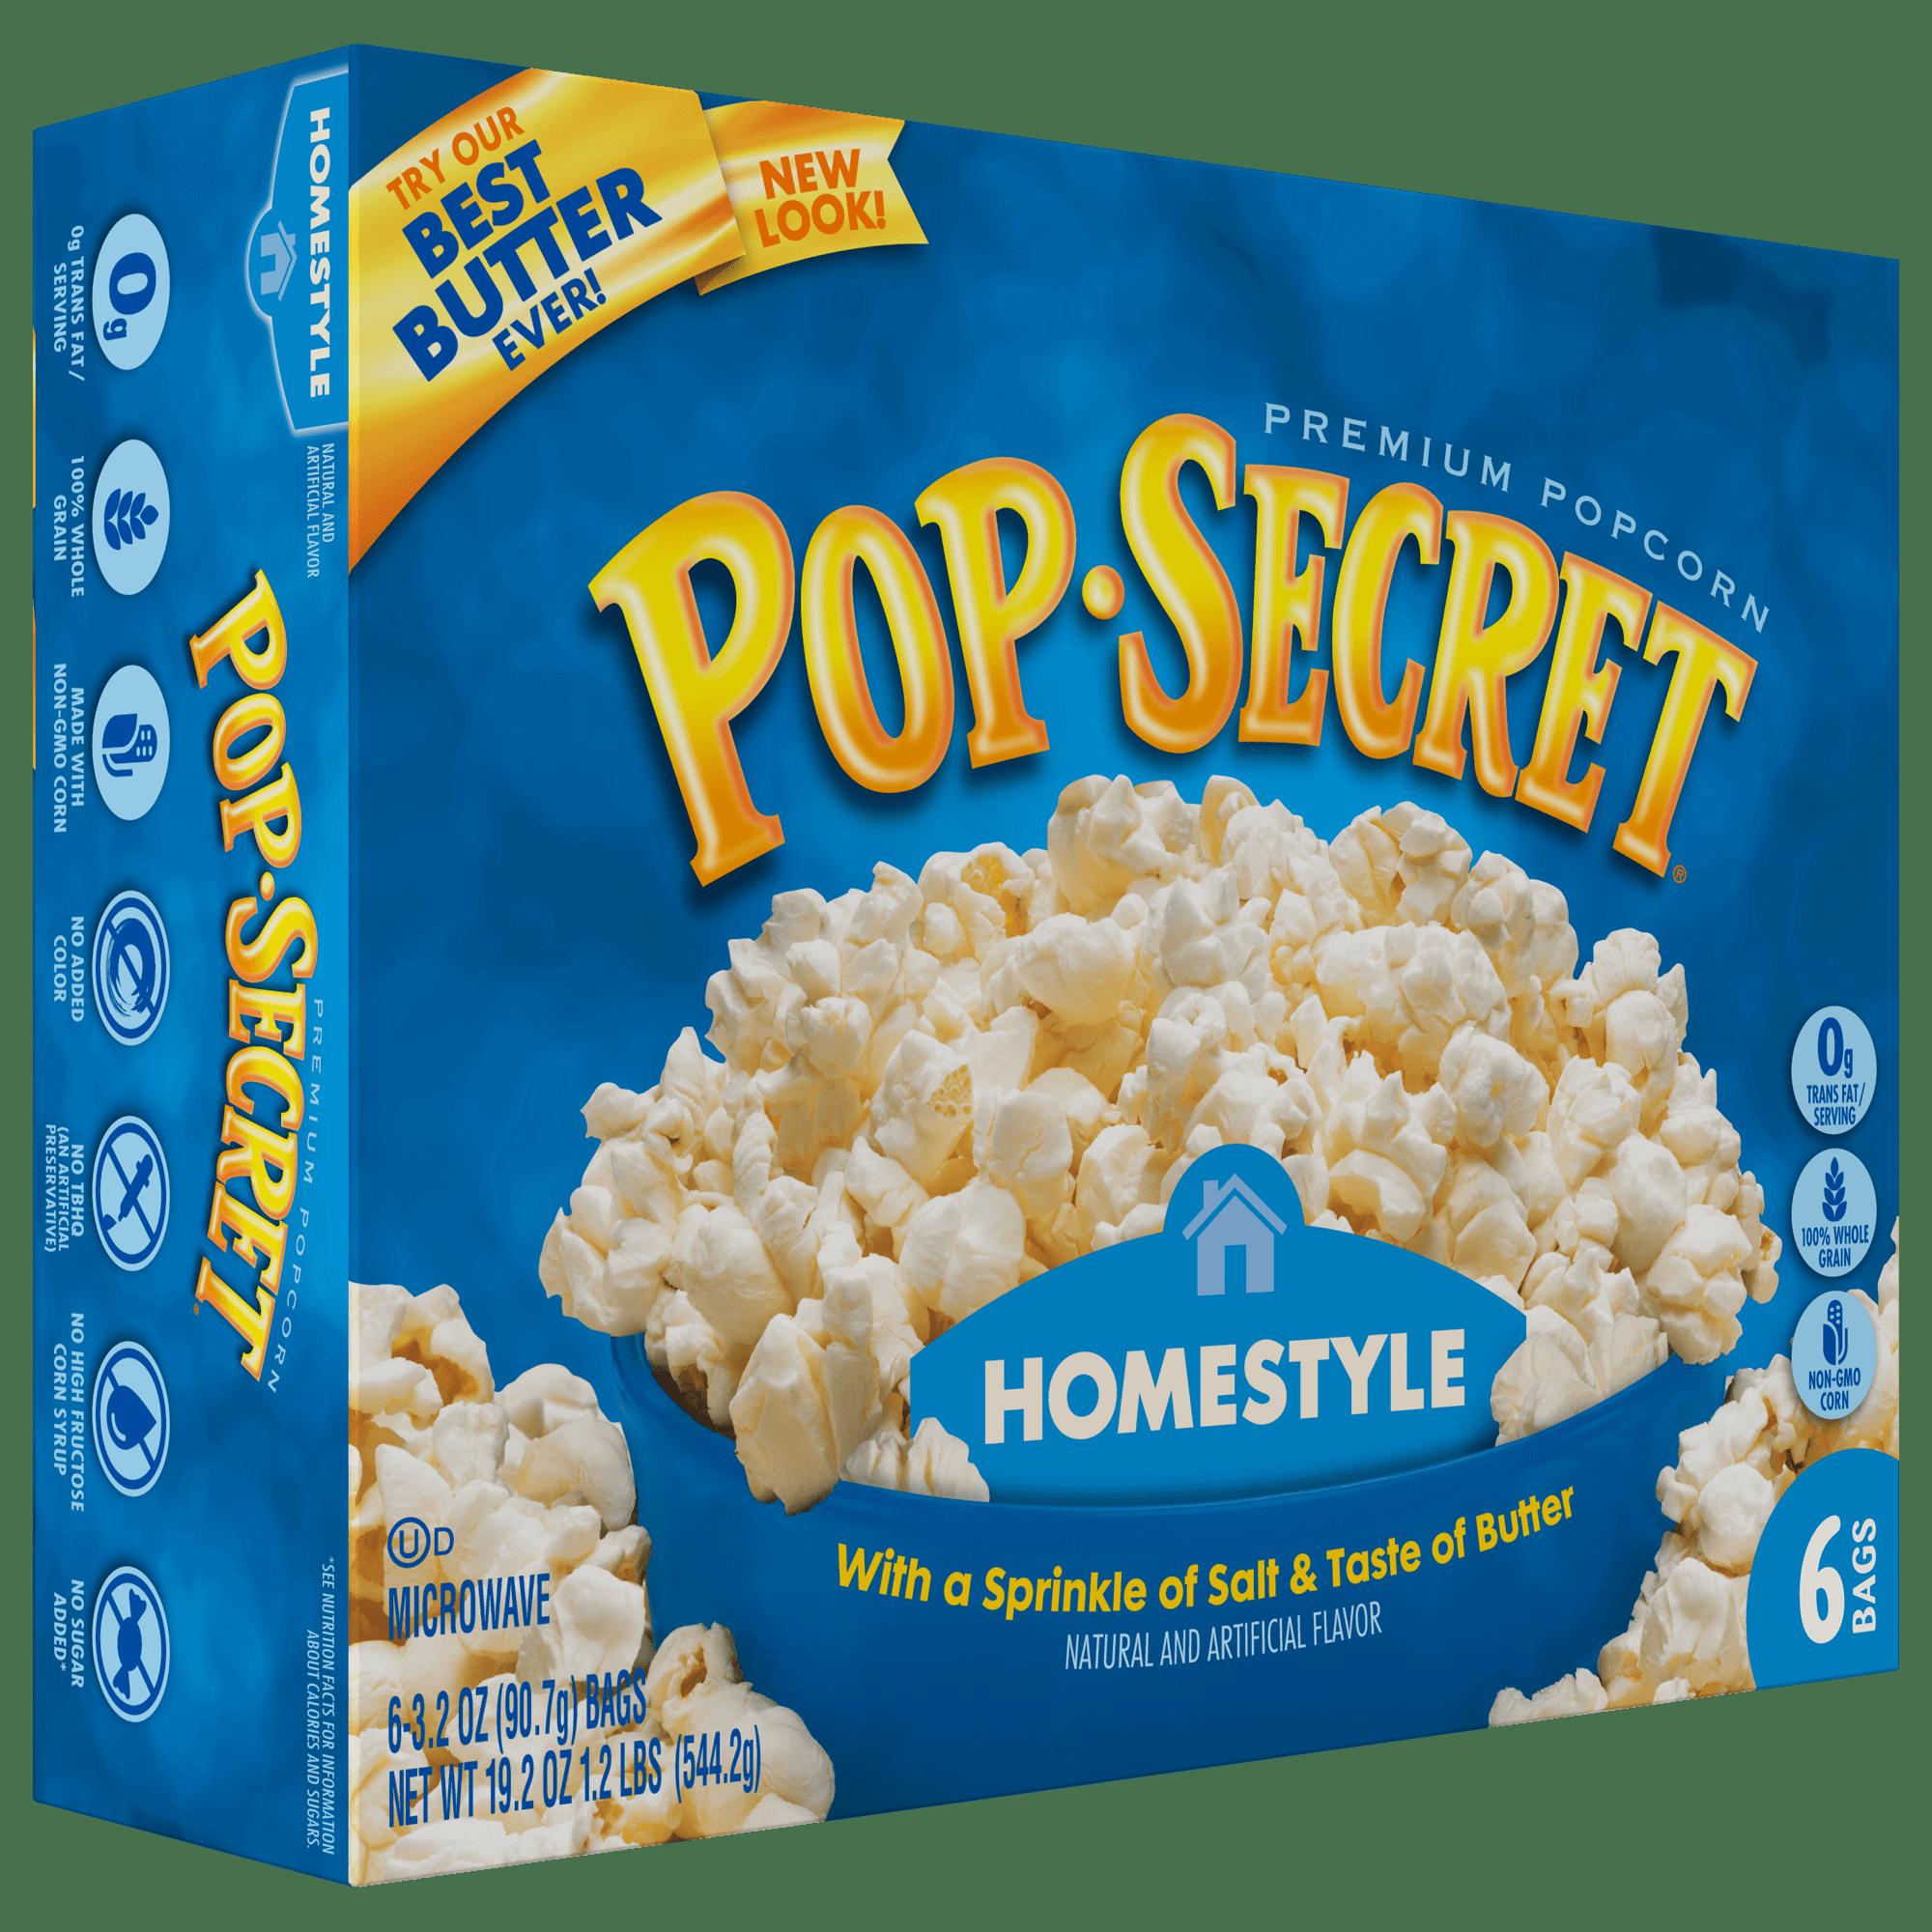 Pop Secret Microwave Popcorn, Homestyle, 3.2 Oz, 6 Ct - Walmart.com